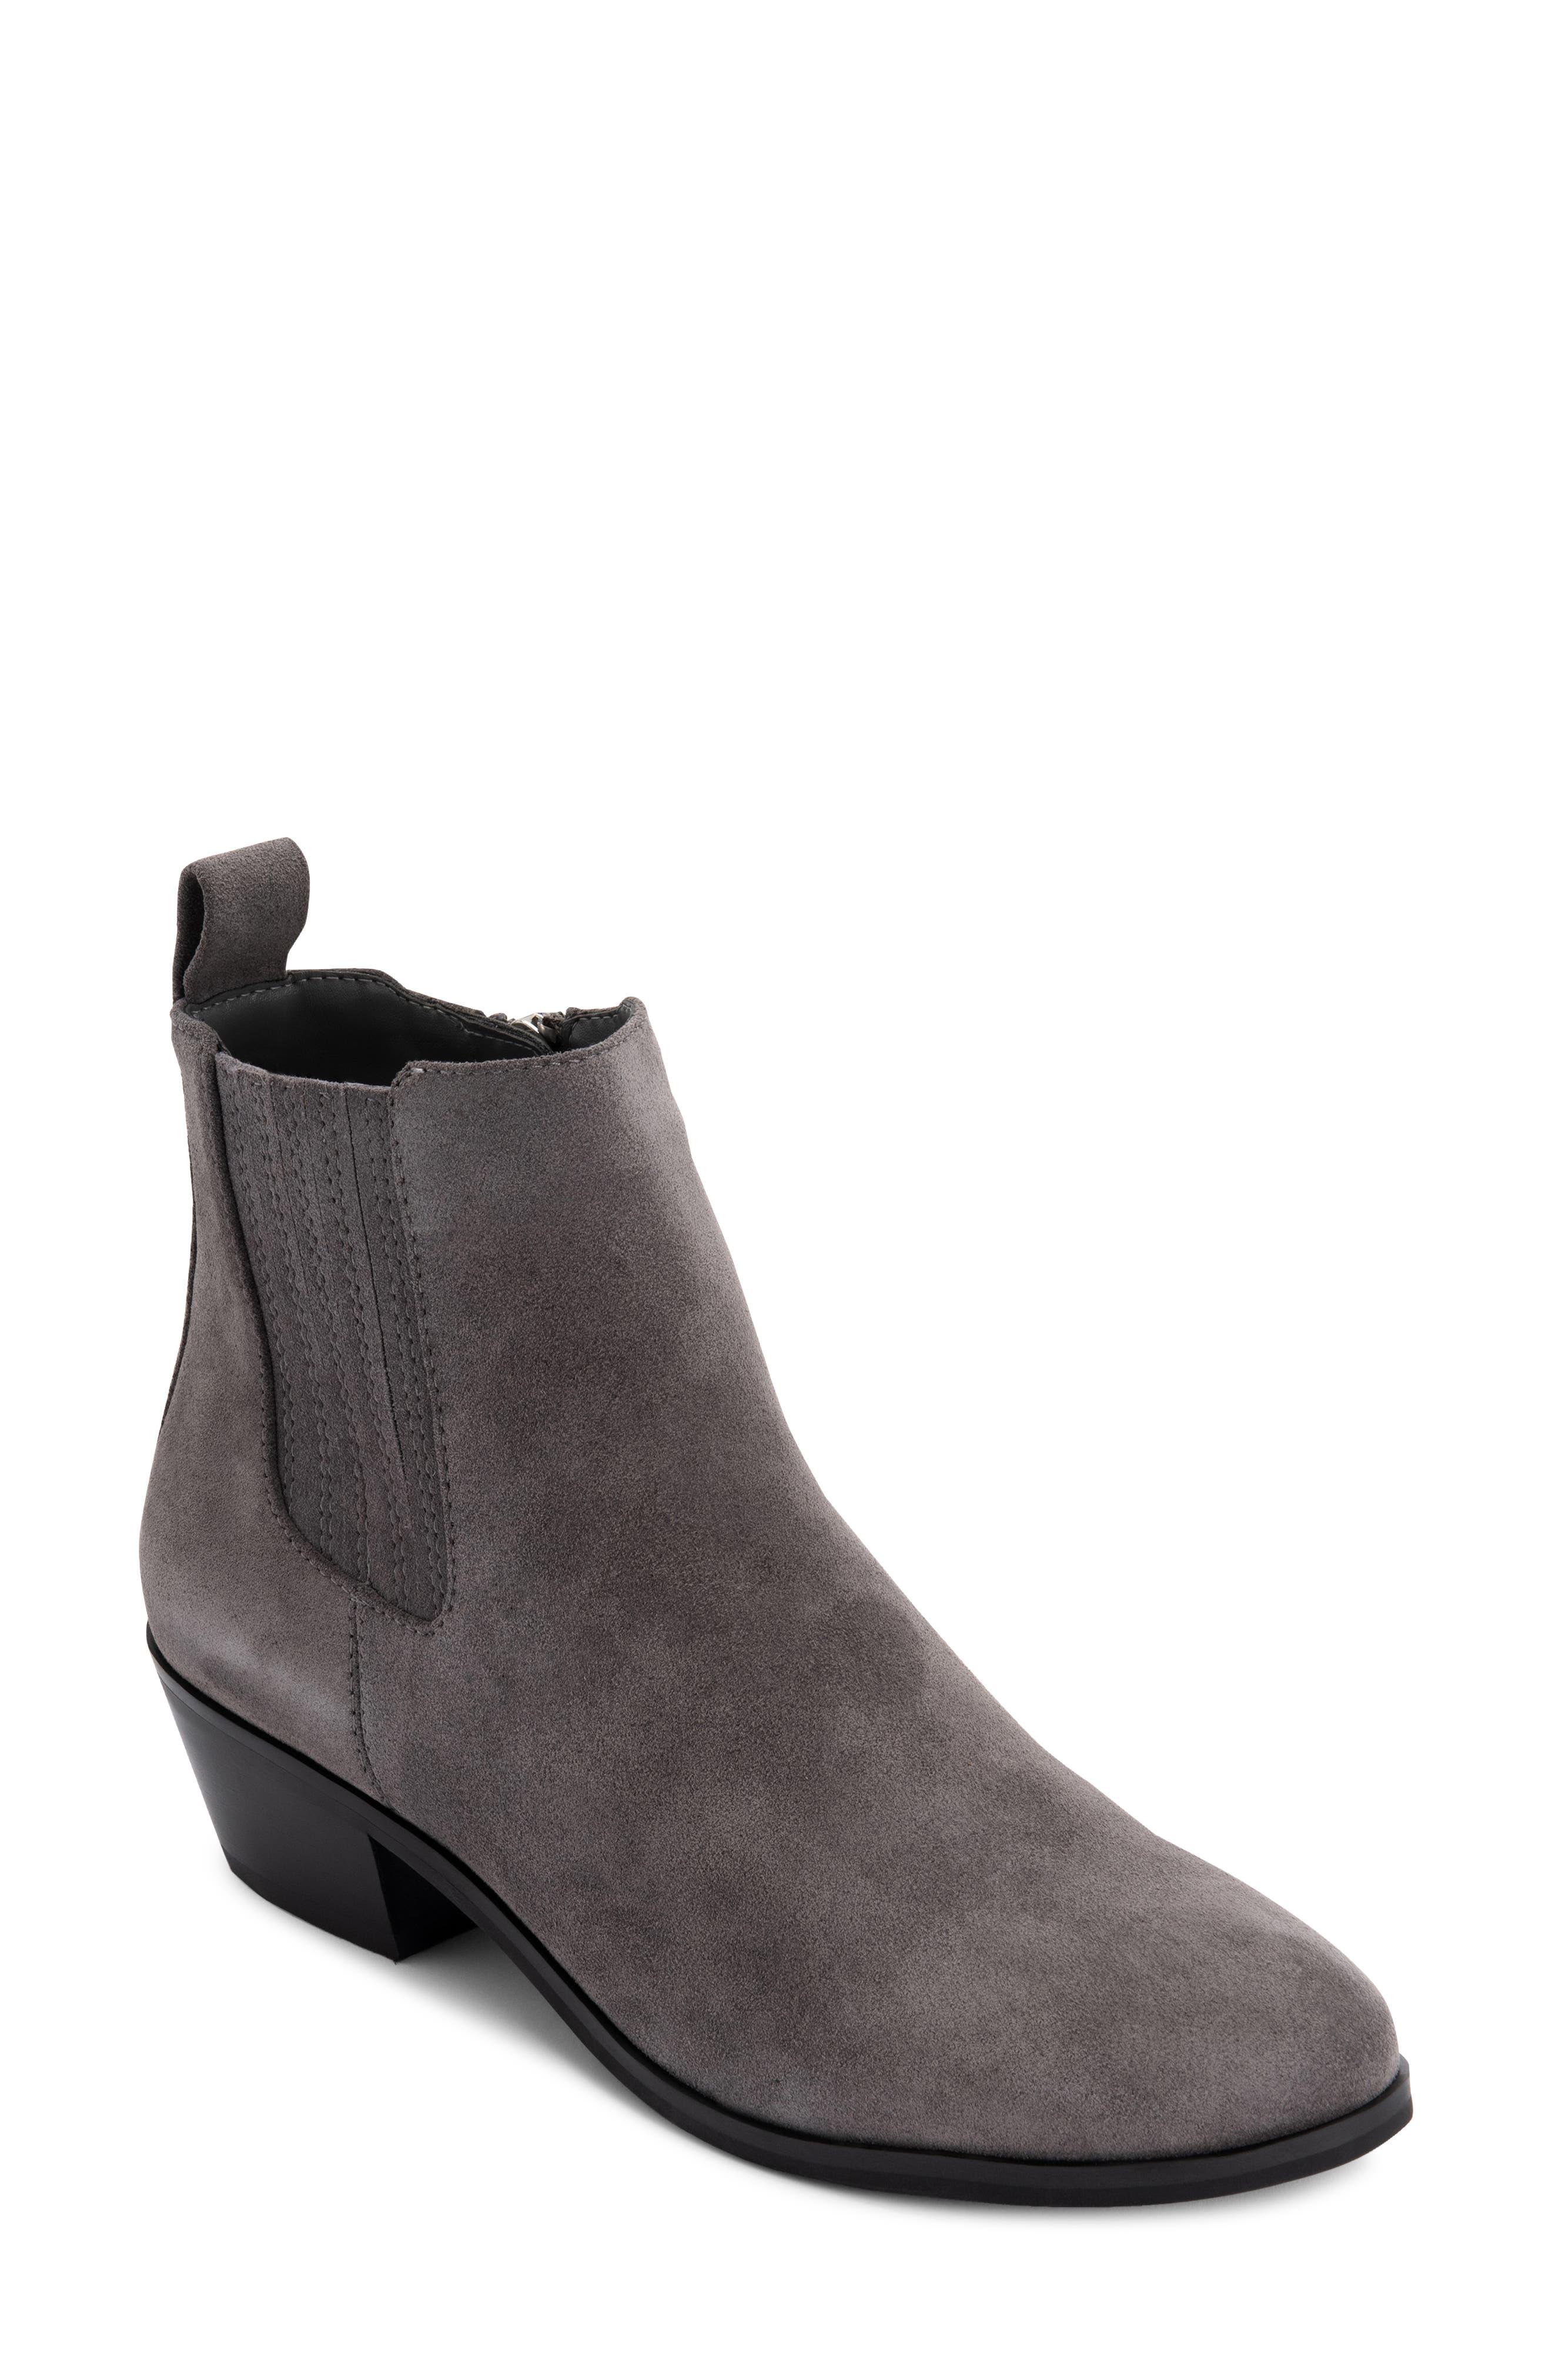 Women's Grey Booties \u0026 Ankle Boots